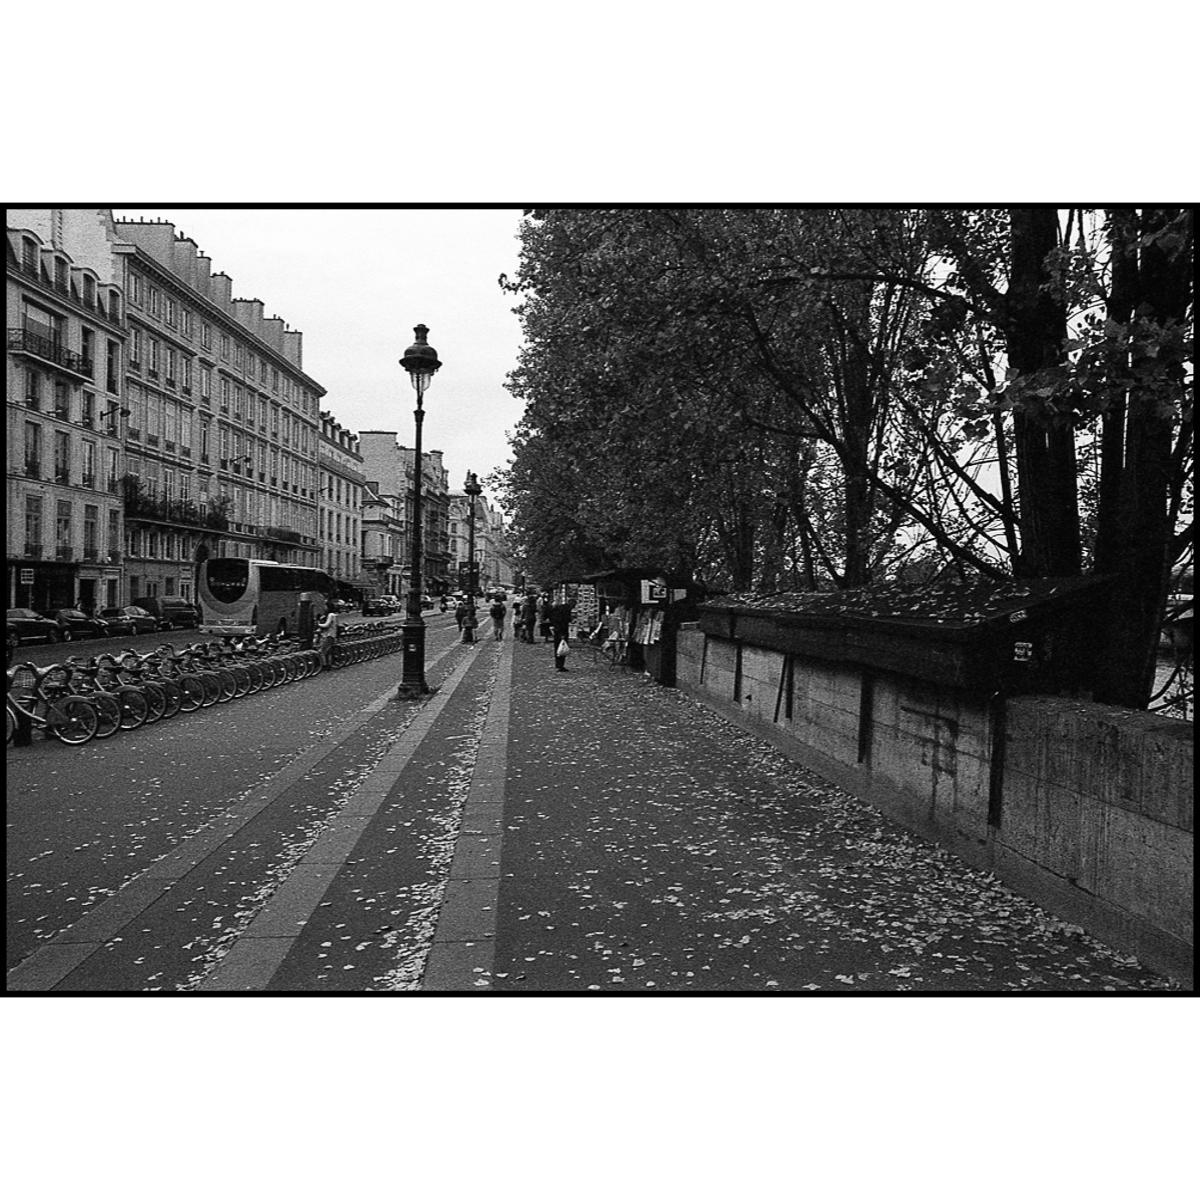 paris file-088.jpg